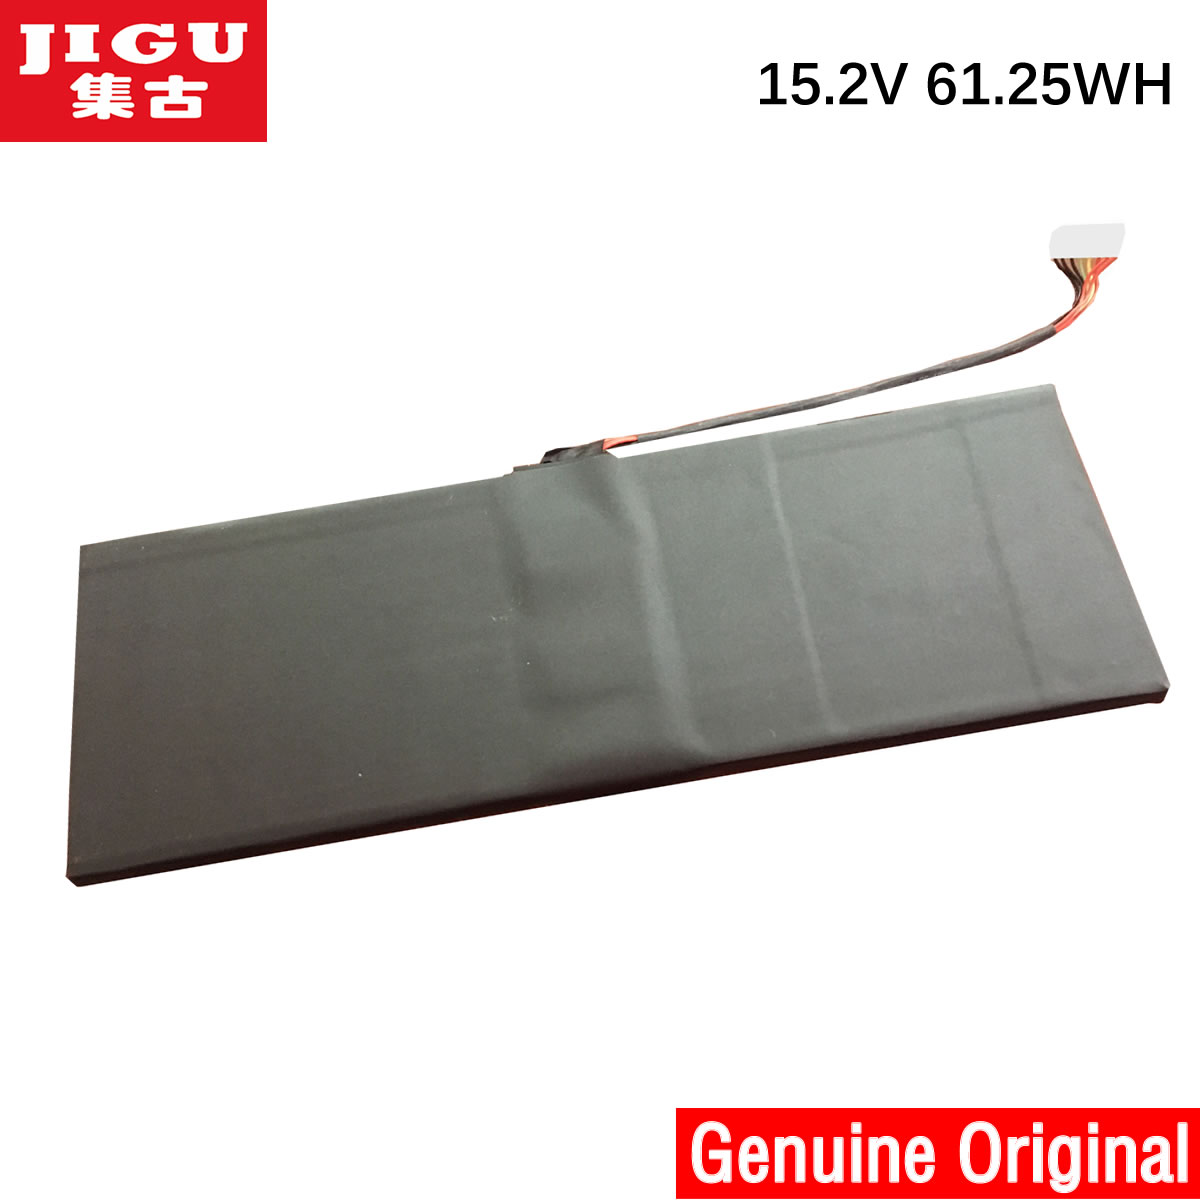 JIGU Original laptop battery GNC-J40 916TA013F for SCHENKER XMG C504 FOR GIGABYTE P34G v2 P34 V4 P34G v2 P34W v3 v4 gnc 300mg 100